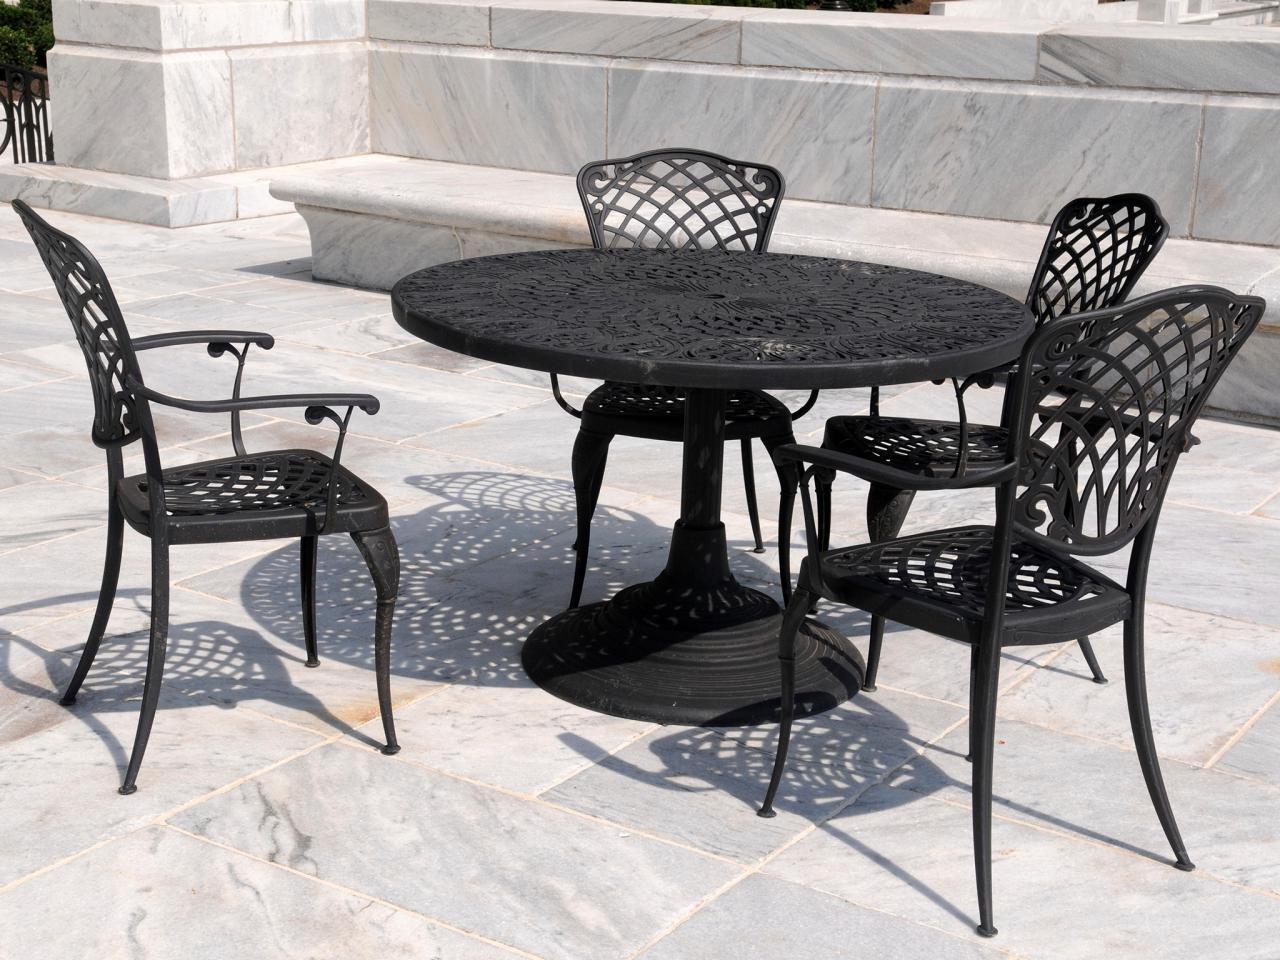 Popular Vintage Patio Umbrellas For Sale Pertaining To Black Wrought Iron Patio Furniture — Wilson Home Ideas : Repairing (View 20 of 20)